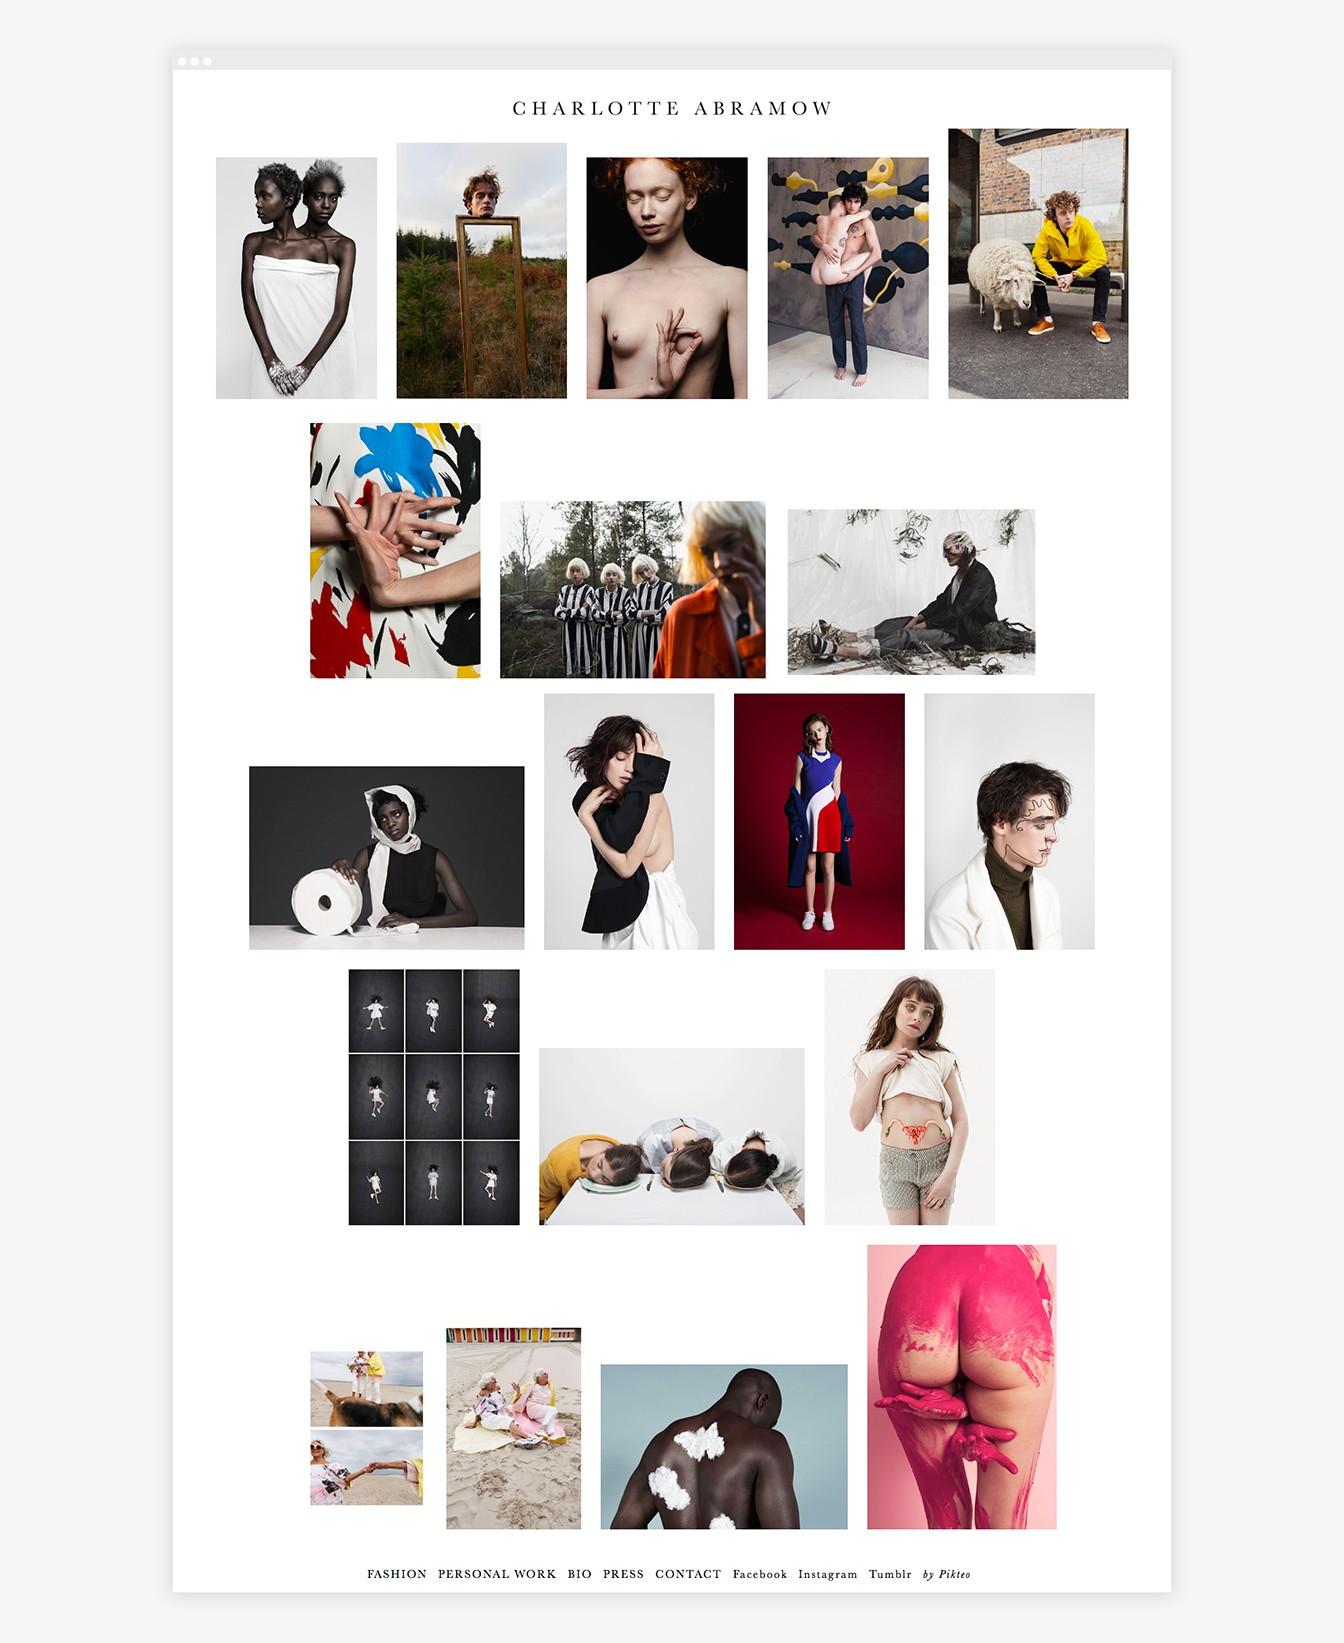 02-charlotte-abramow-web-2016-pikteo-webdesign-graphic-design-freelance-paris-bruxelles-lyon